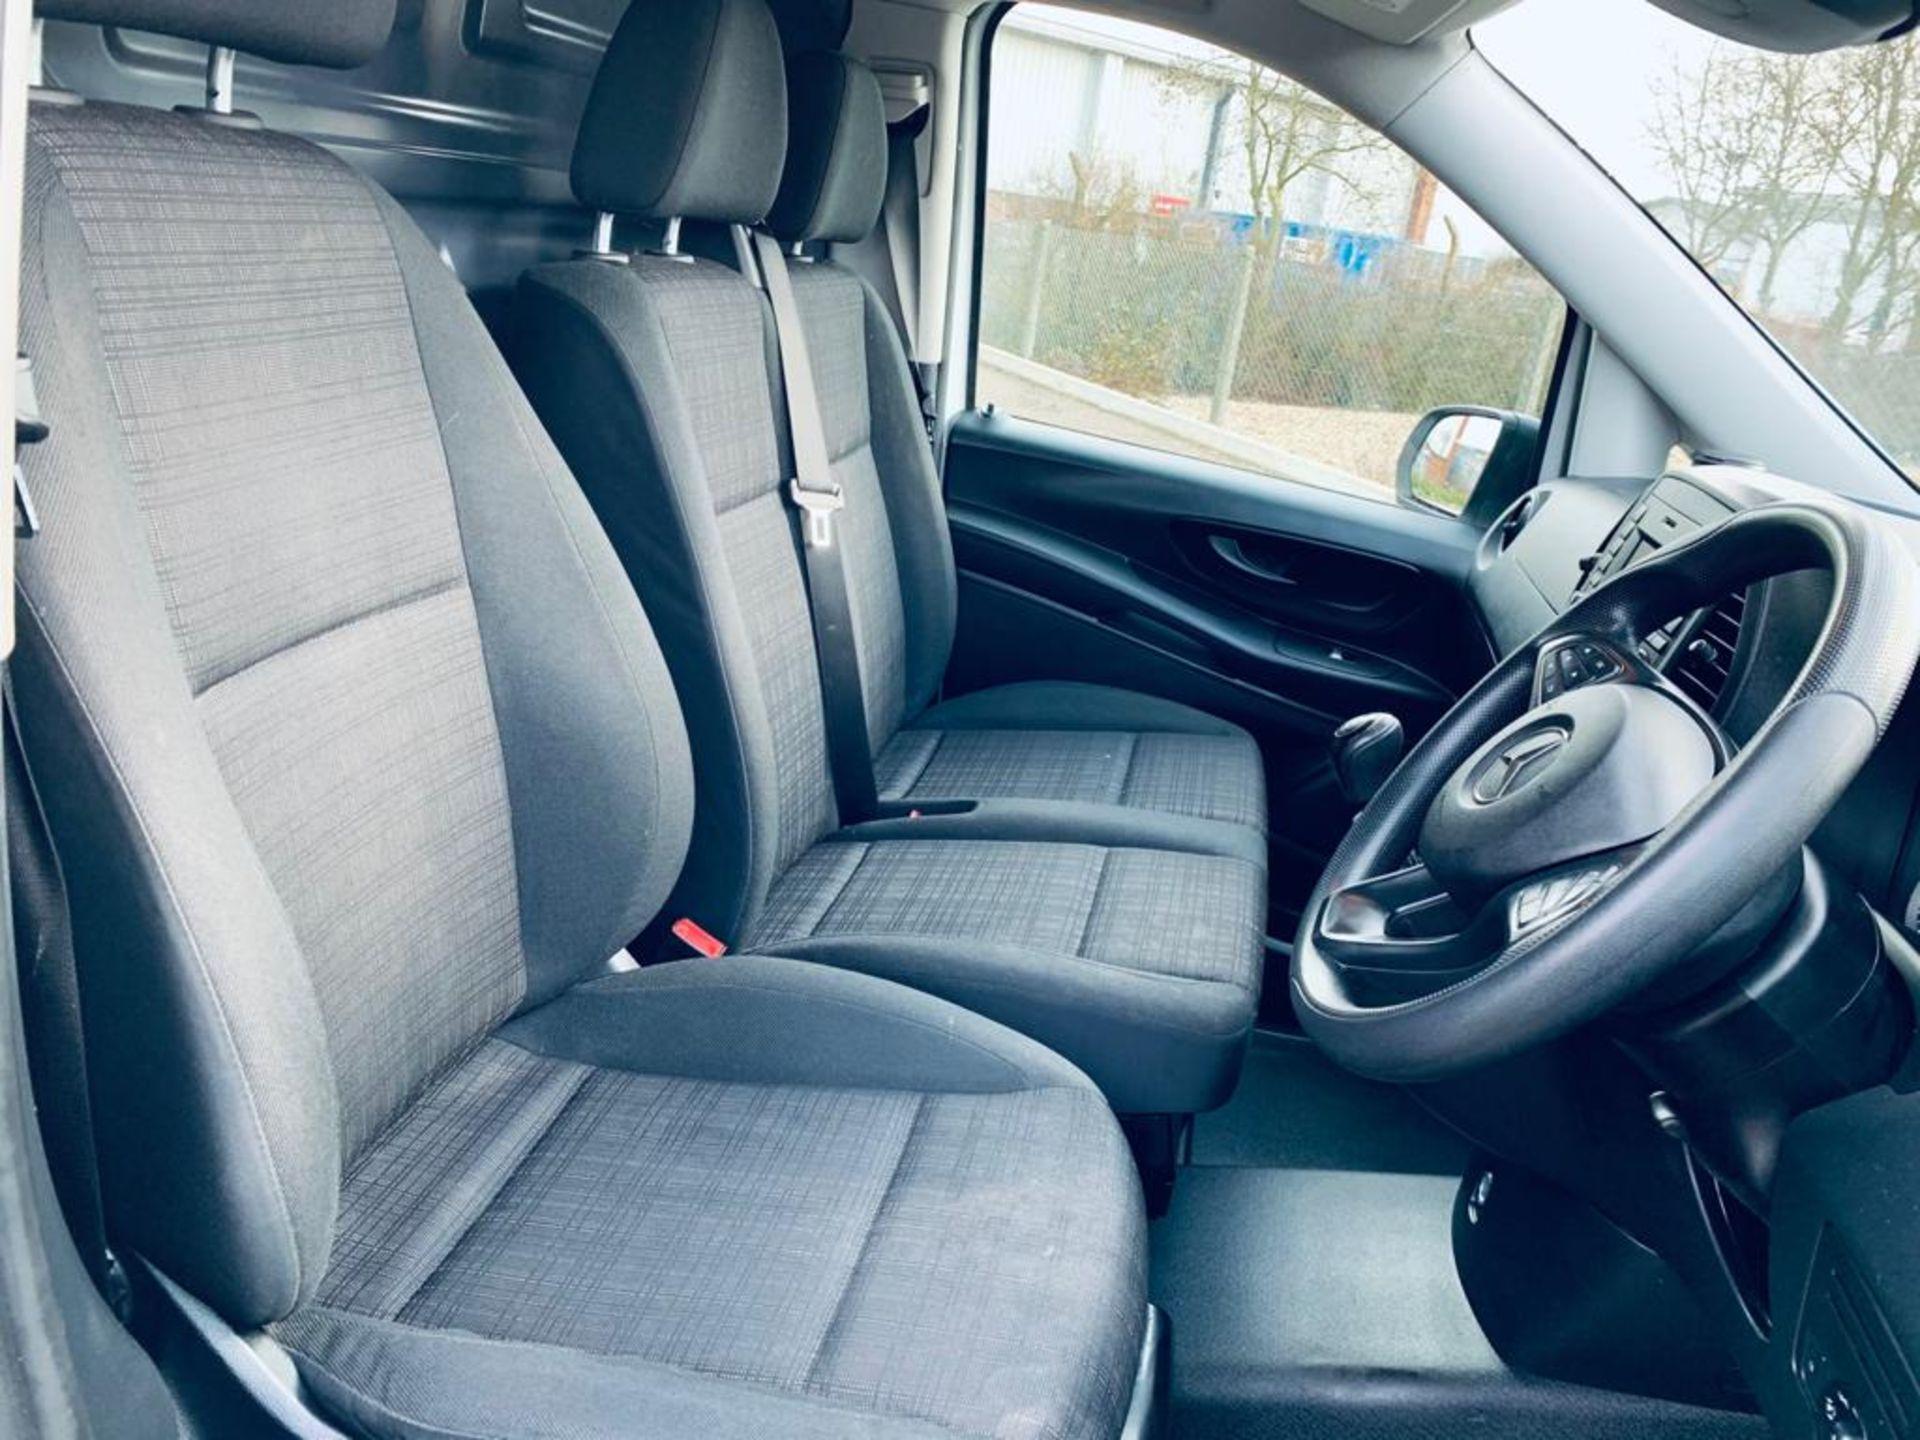 Reserve Met - Mercedes Vito 114CDI Bluetec 2018 18 Reg LWB - Air Con - Euro 6 - FSH - ULEZ - 1 Owner - Image 13 of 26